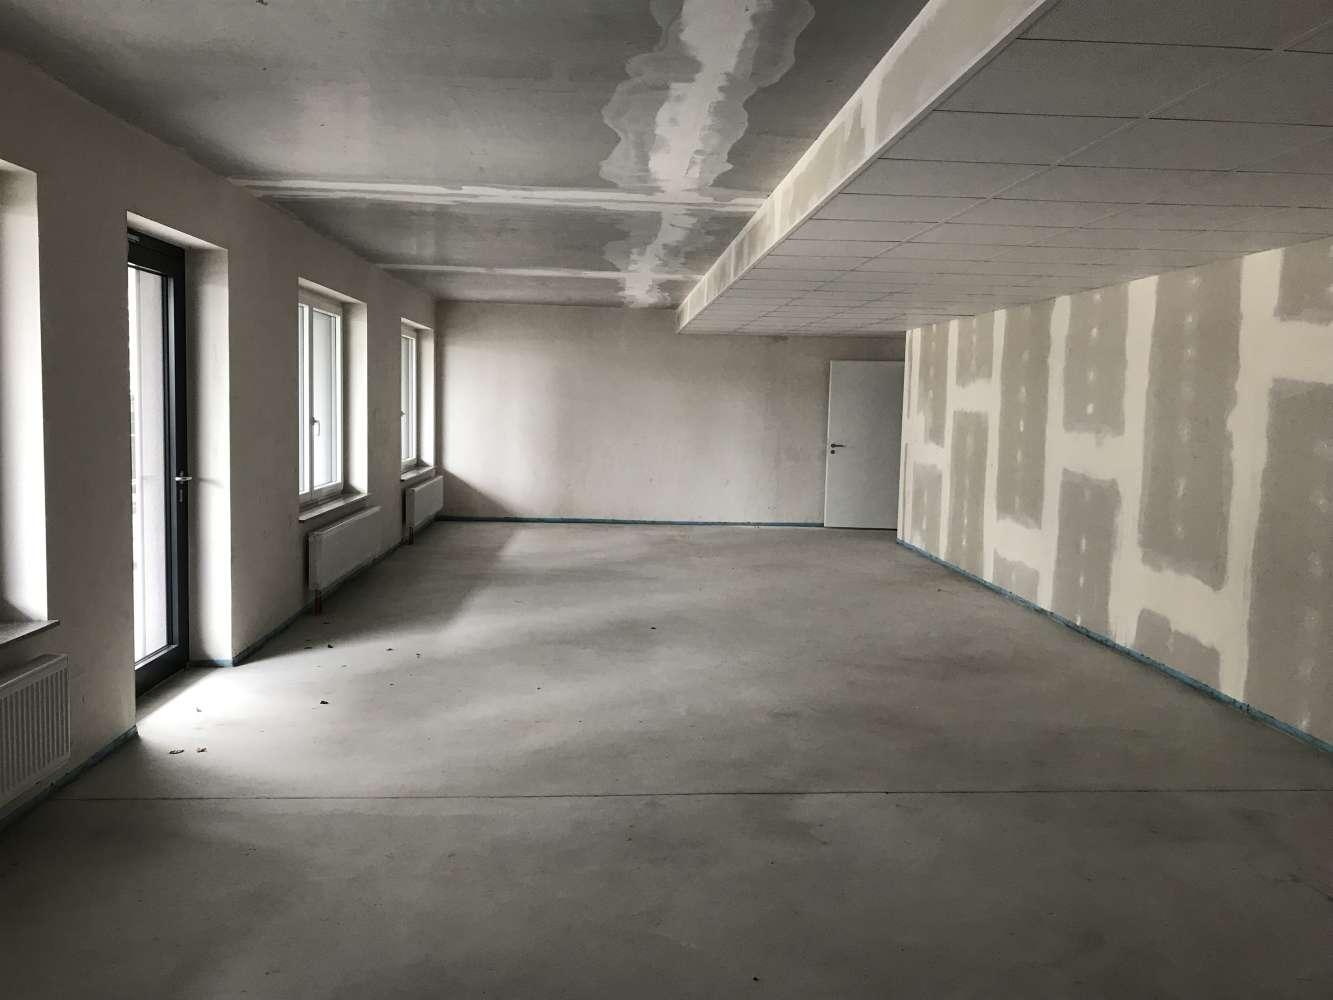 Büros Leinfelden-echterdingen, 70771 - Büro - Leinfelden-Echterdingen, Echterdingen - S0627 - 10443153